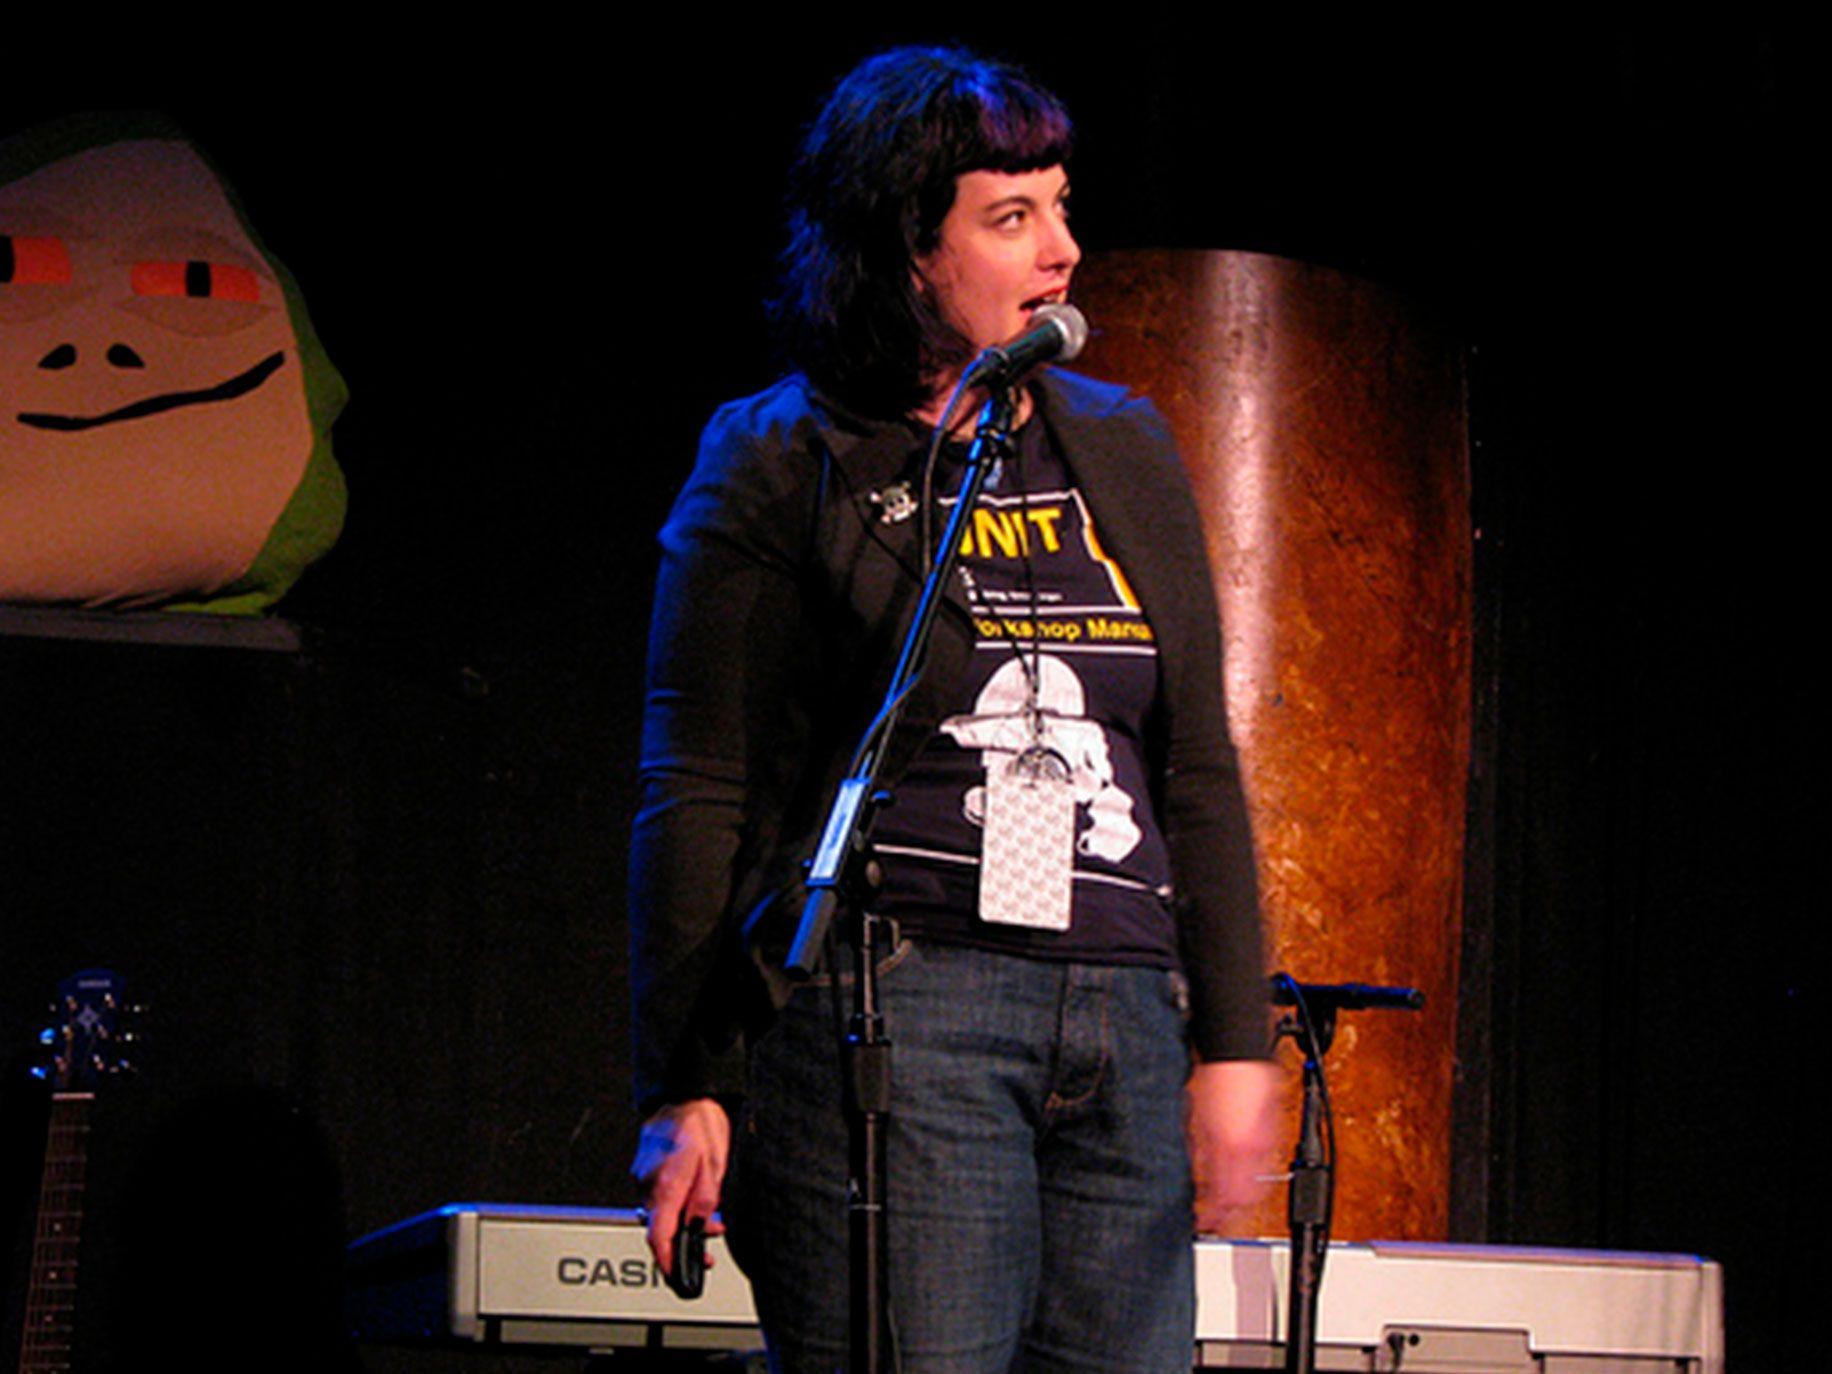 Bonnie Burton talks about making bizarre Star Wars crafts on stage at w00tstock San Francisco in 2010.